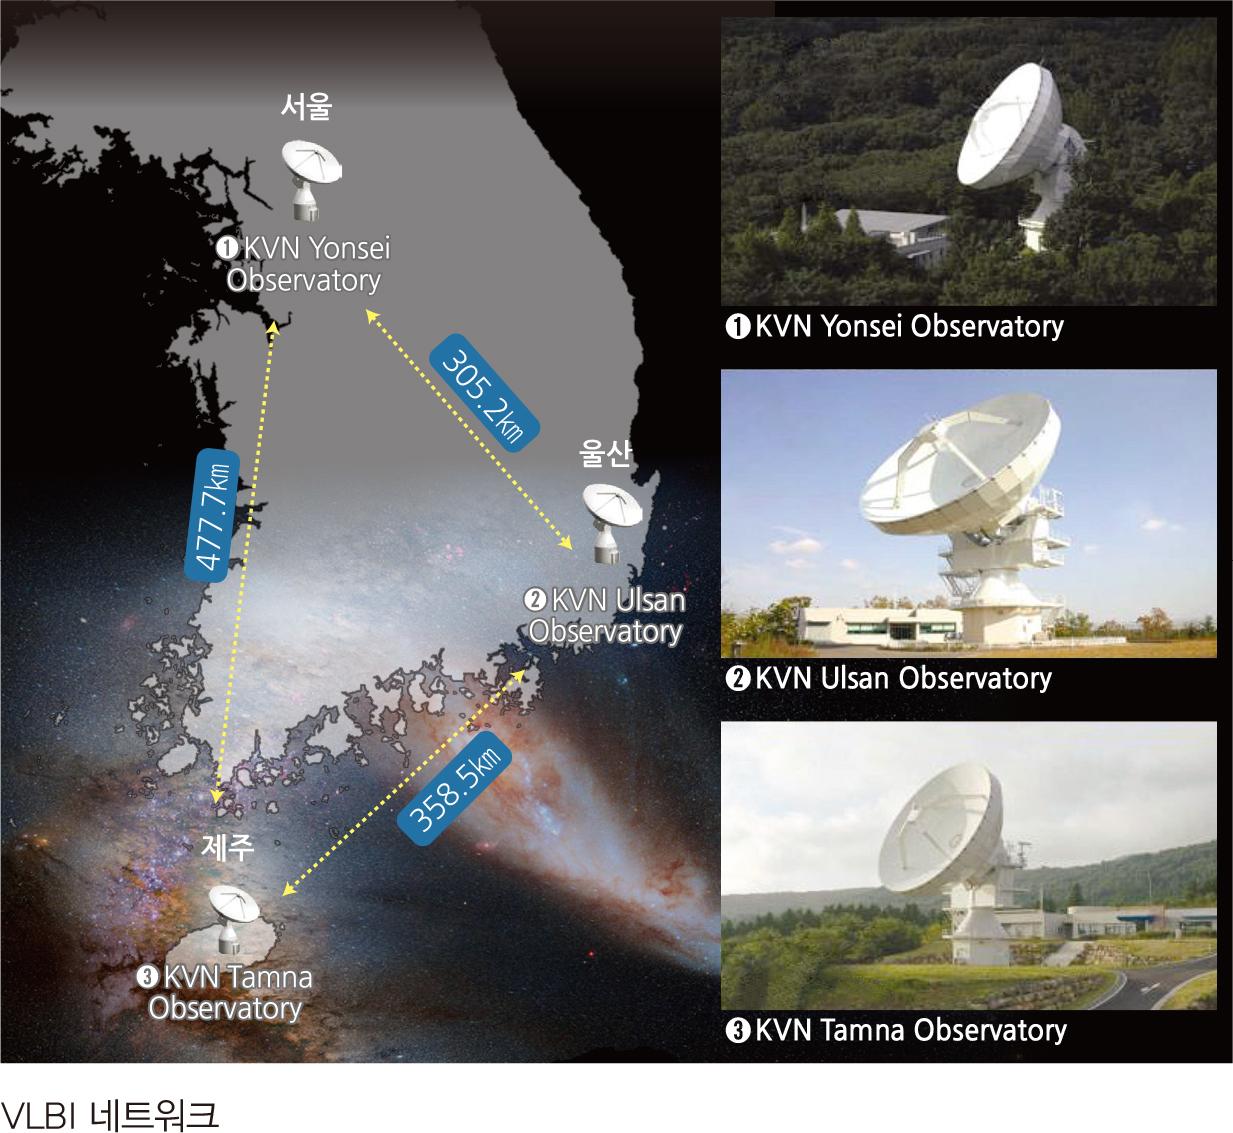 VLBI 네트워크